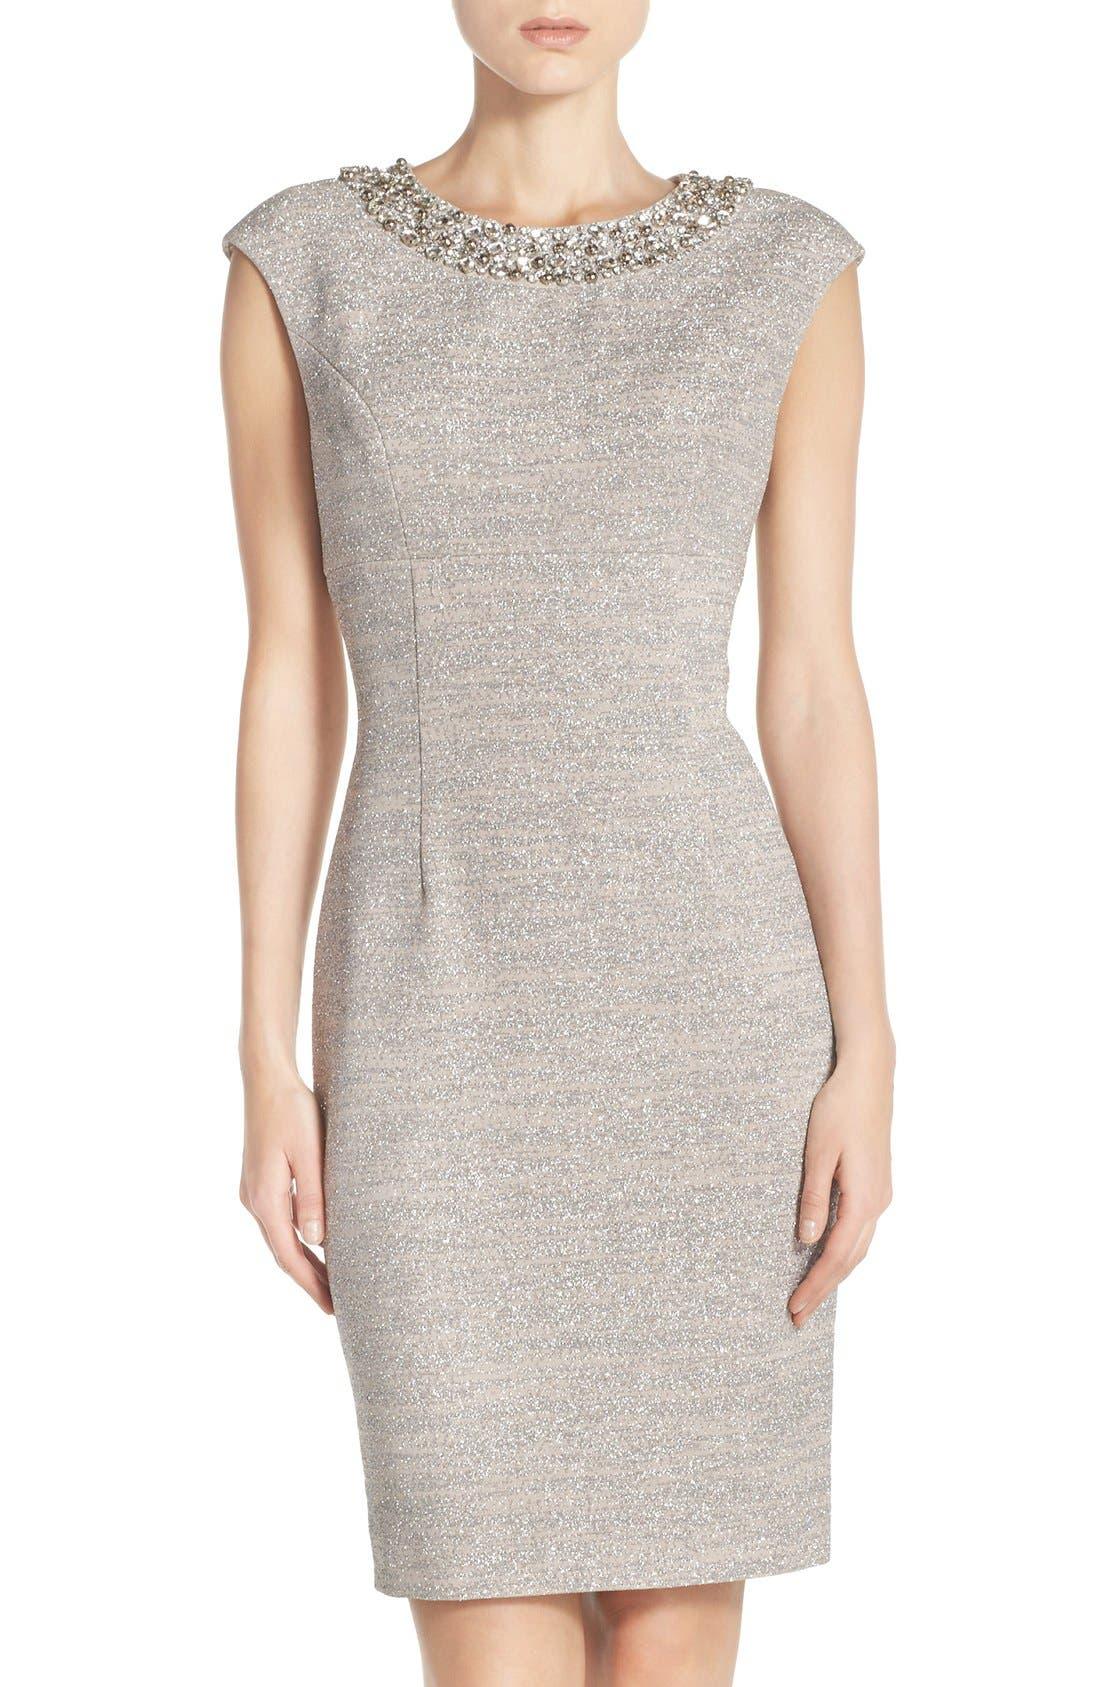 Main Image - Eliza J Embellished Sparkle Knit Sheath Dress (Regular & Petite)